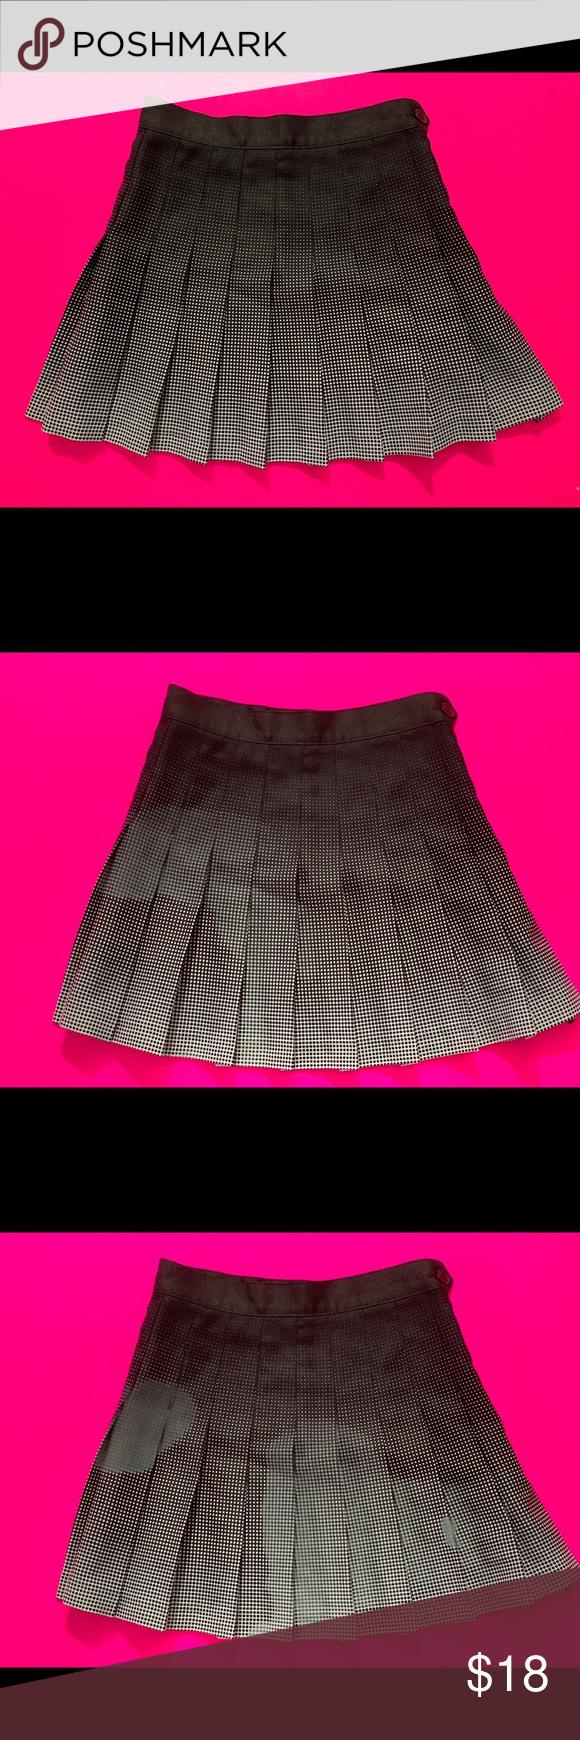 22ef90032 American Apparel Black Tennis Skirt ORIGINAL American Apparel Black White  Ombre Gradient Pleated Tennis Skirt XS Brand new never been worn American  Apparel ...